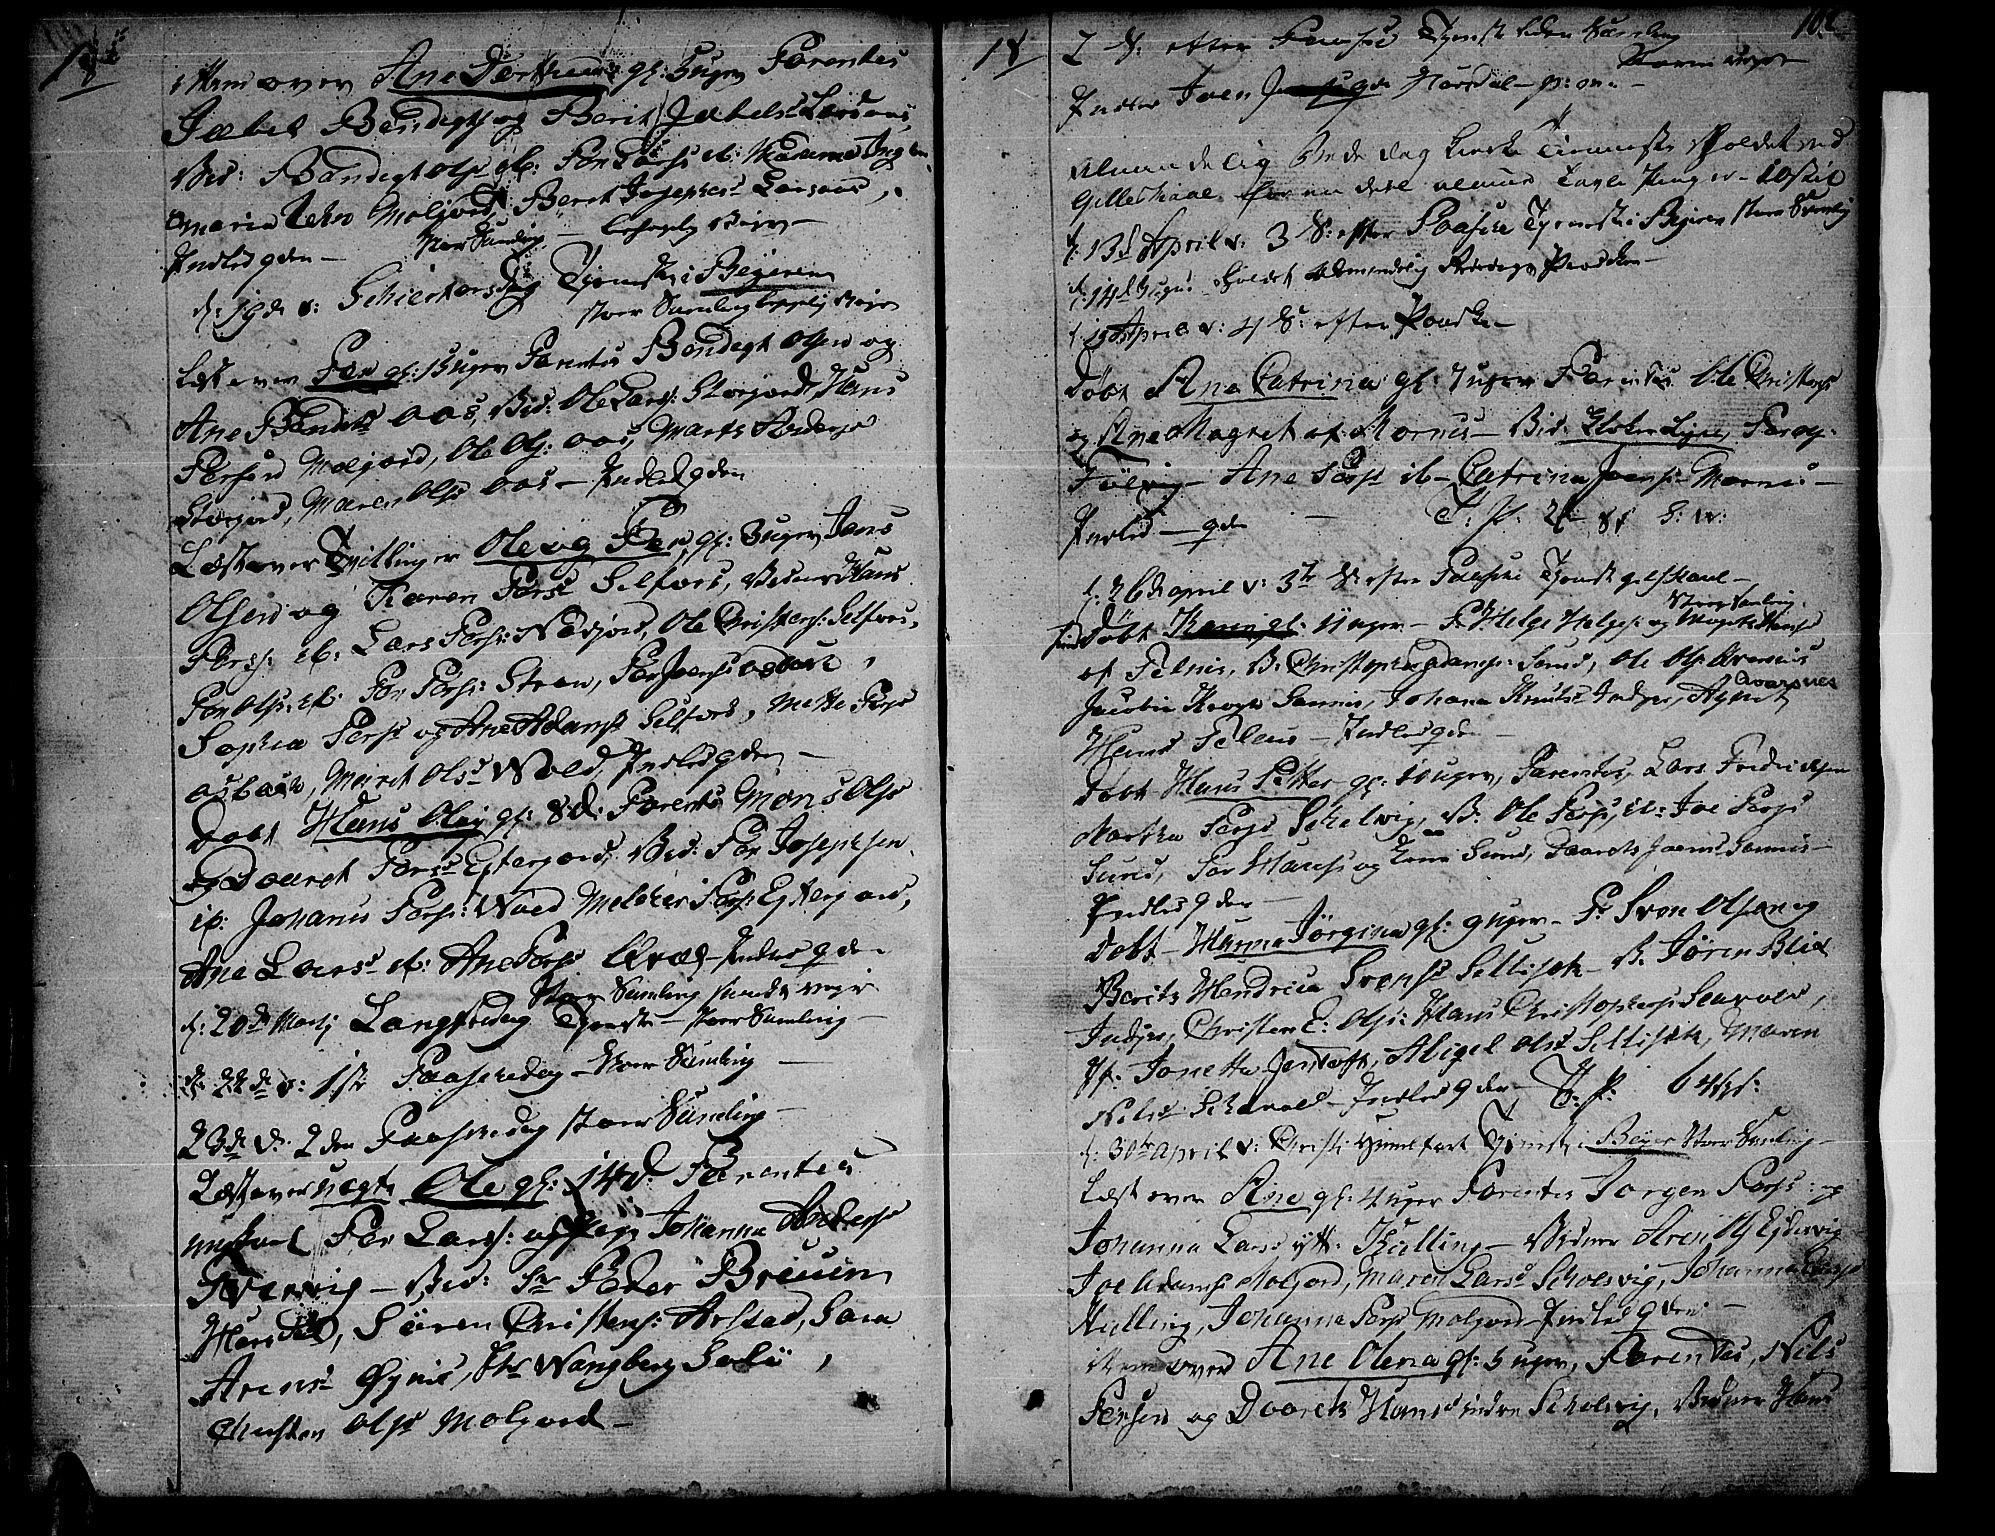 SAT, Ministerialprotokoller, klokkerbøker og fødselsregistre - Nordland, 805/L0095: Ministerialbok nr. 805A02, 1805-1826, s. 102